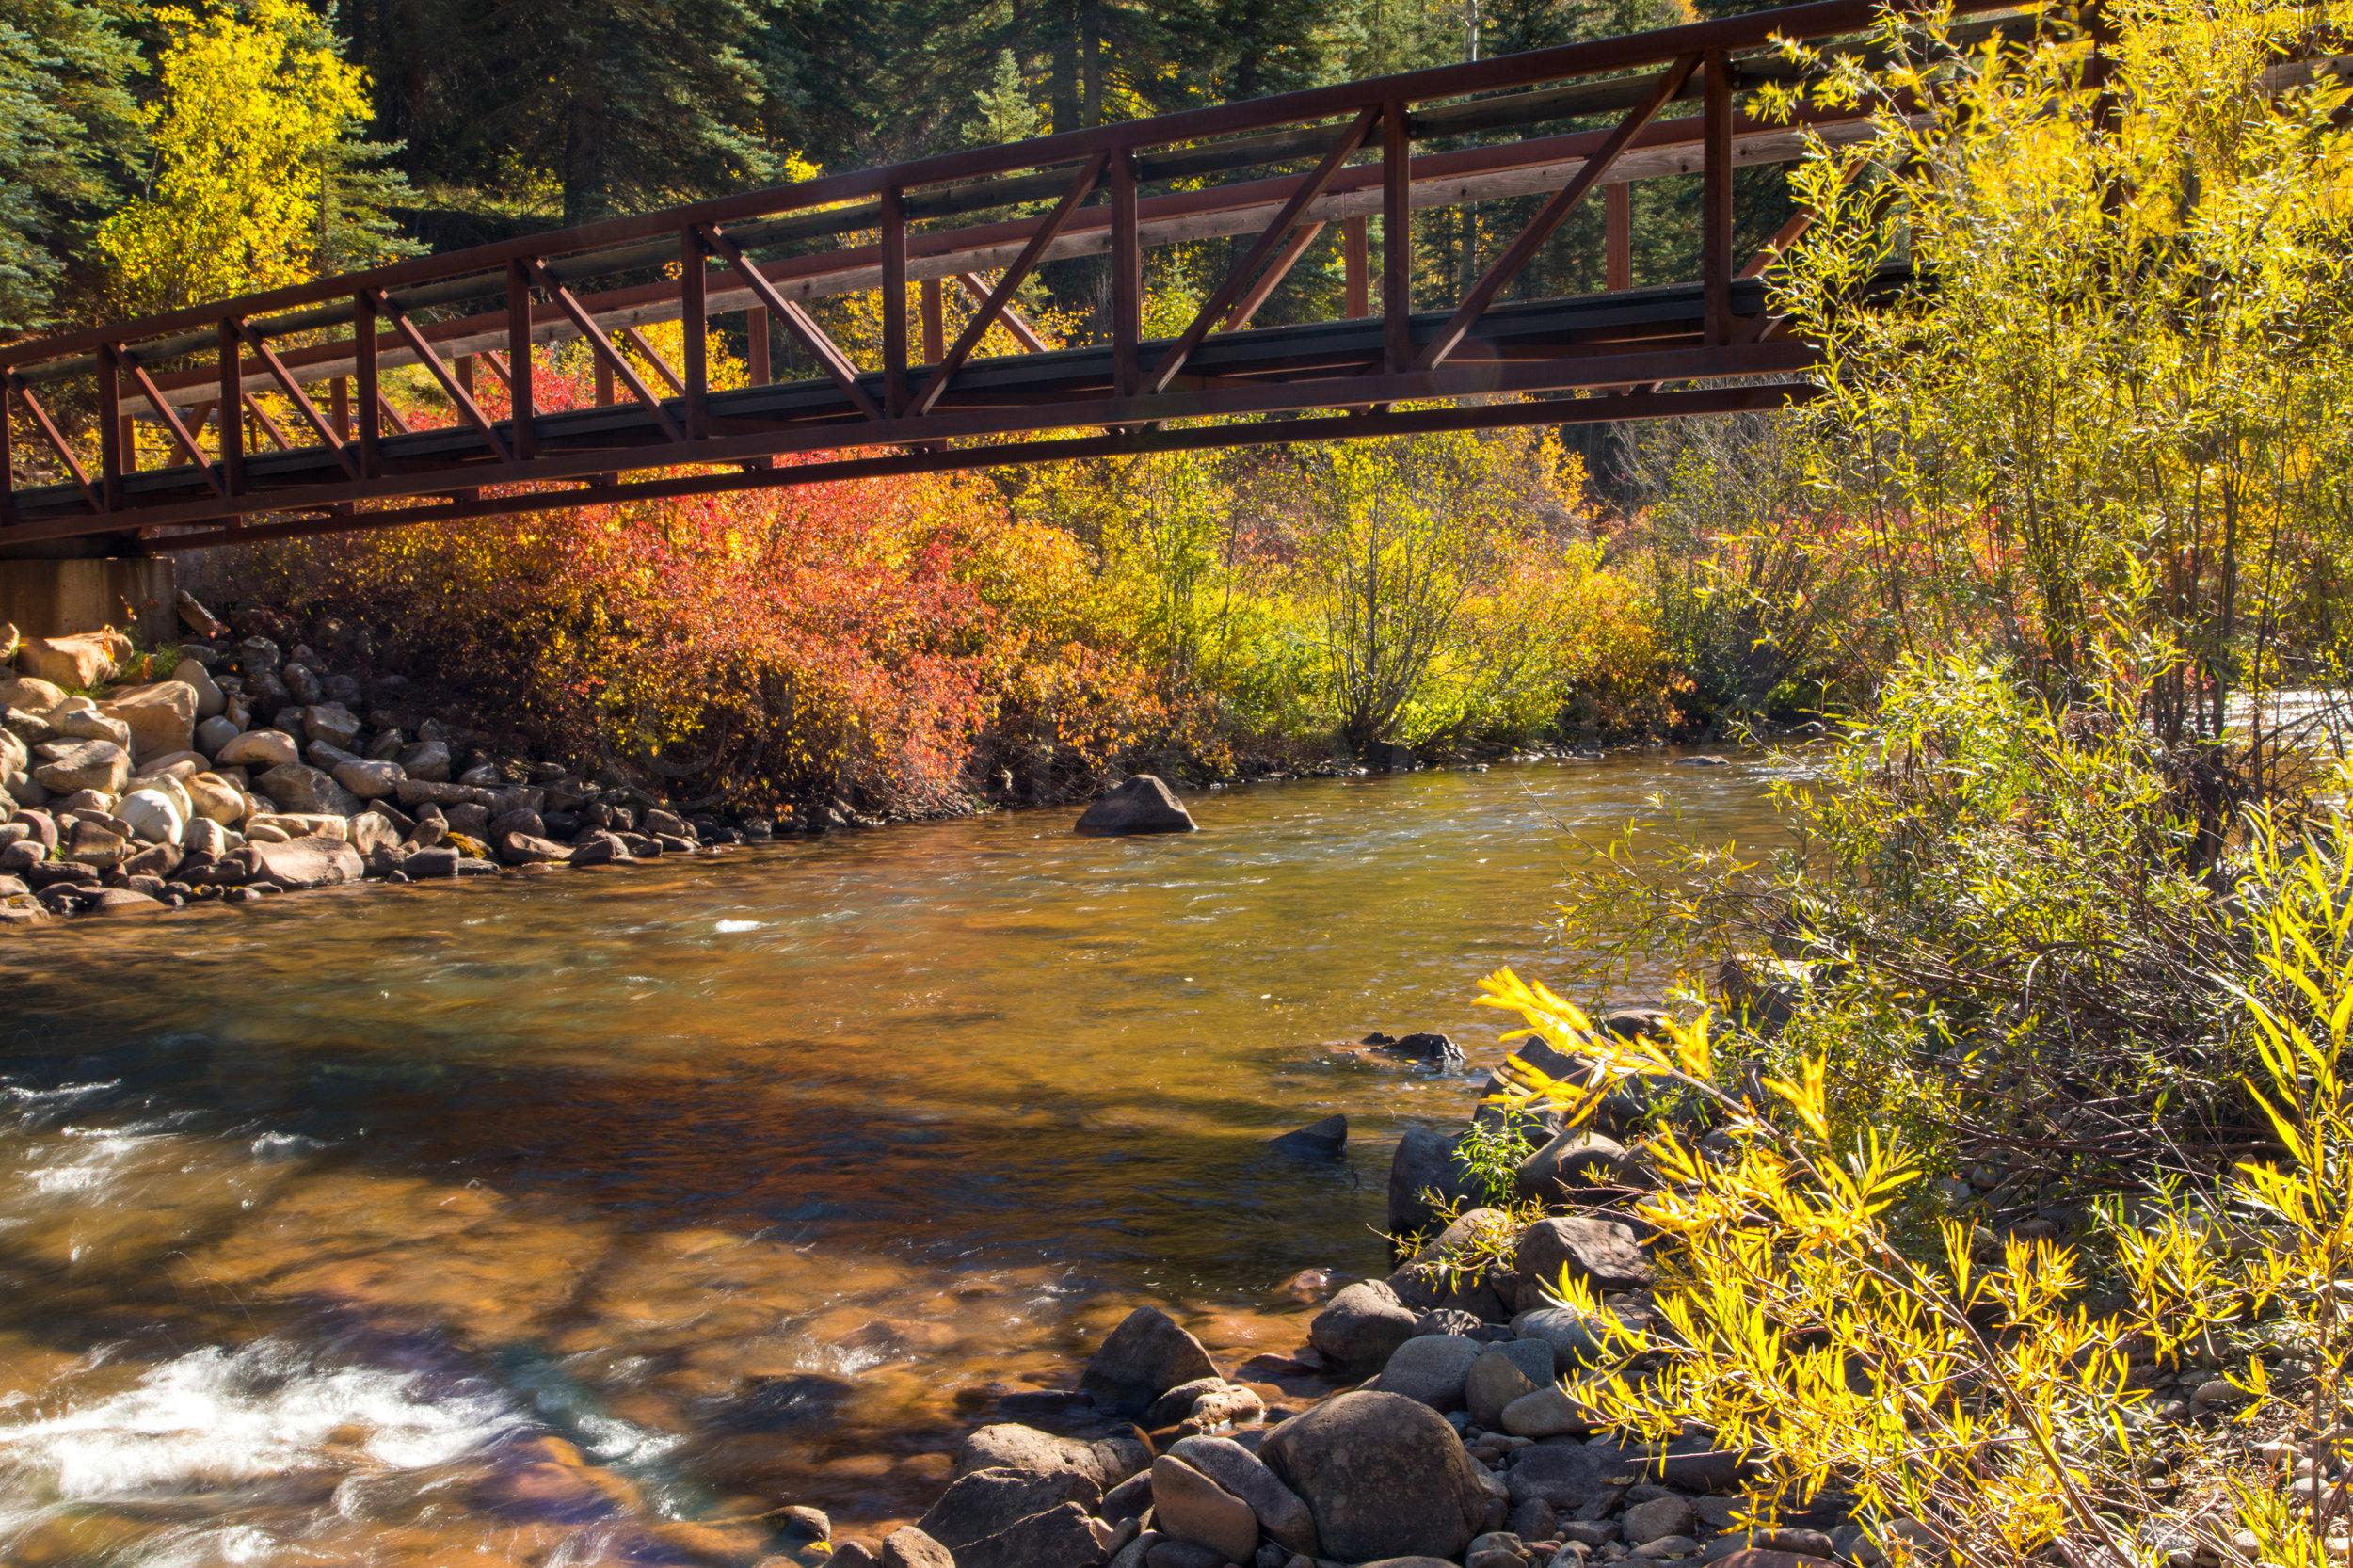 Bear Creek Trailhead, Image # 9619